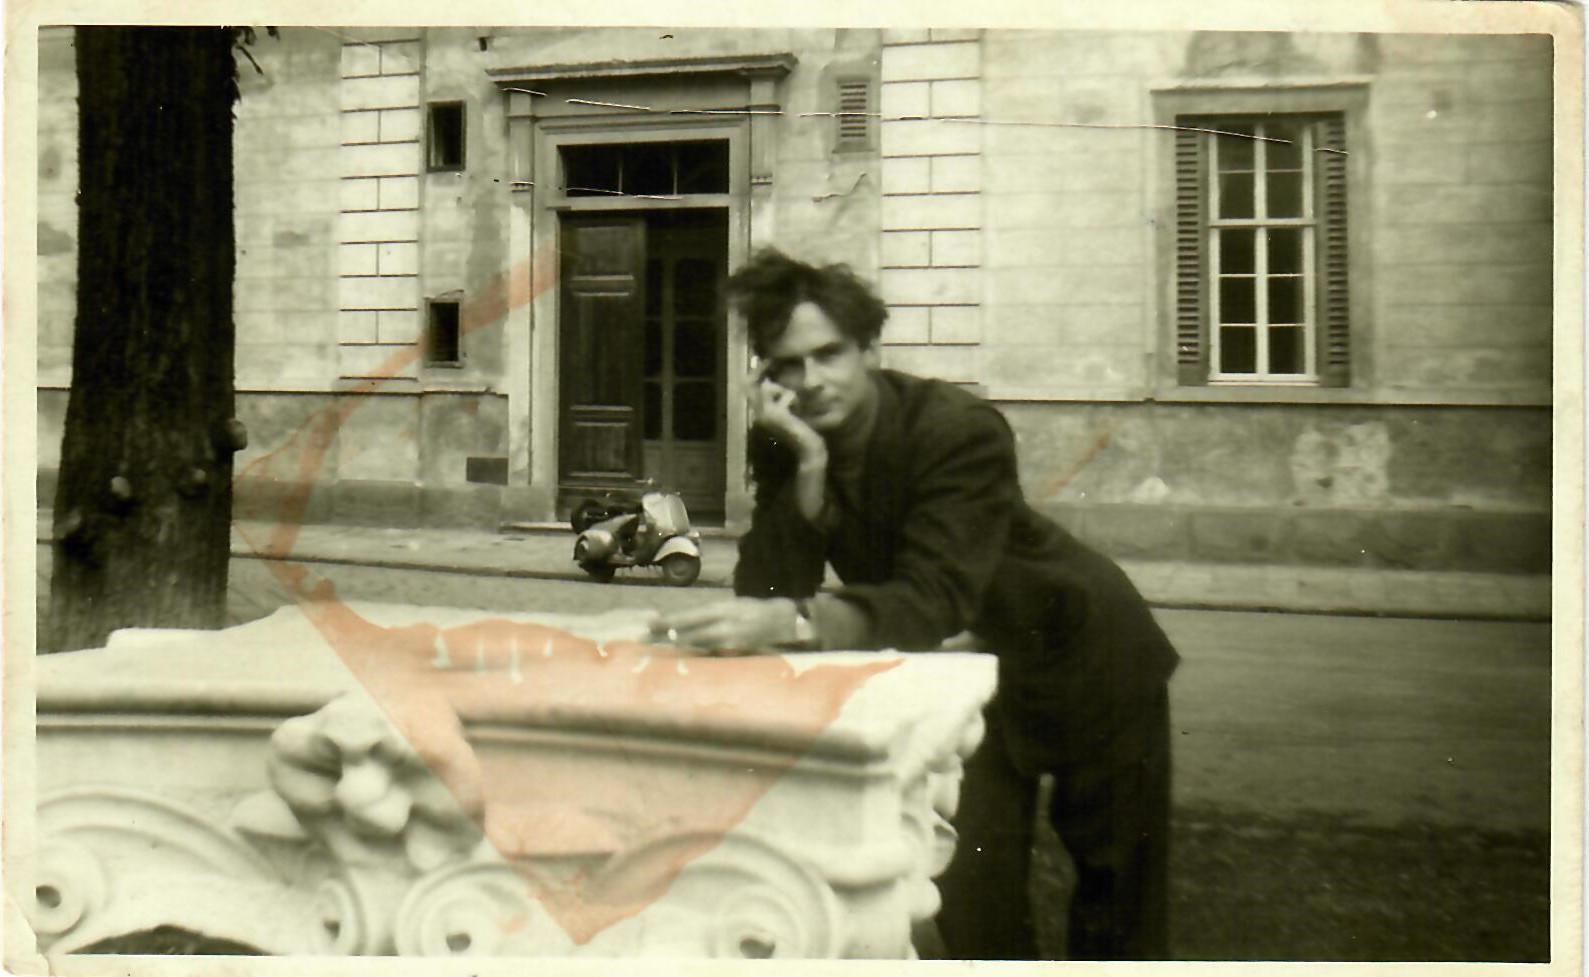 "#18 Piazzale Donatello, 1953, with his Itallian ""Limo"", a Vespa, in background"